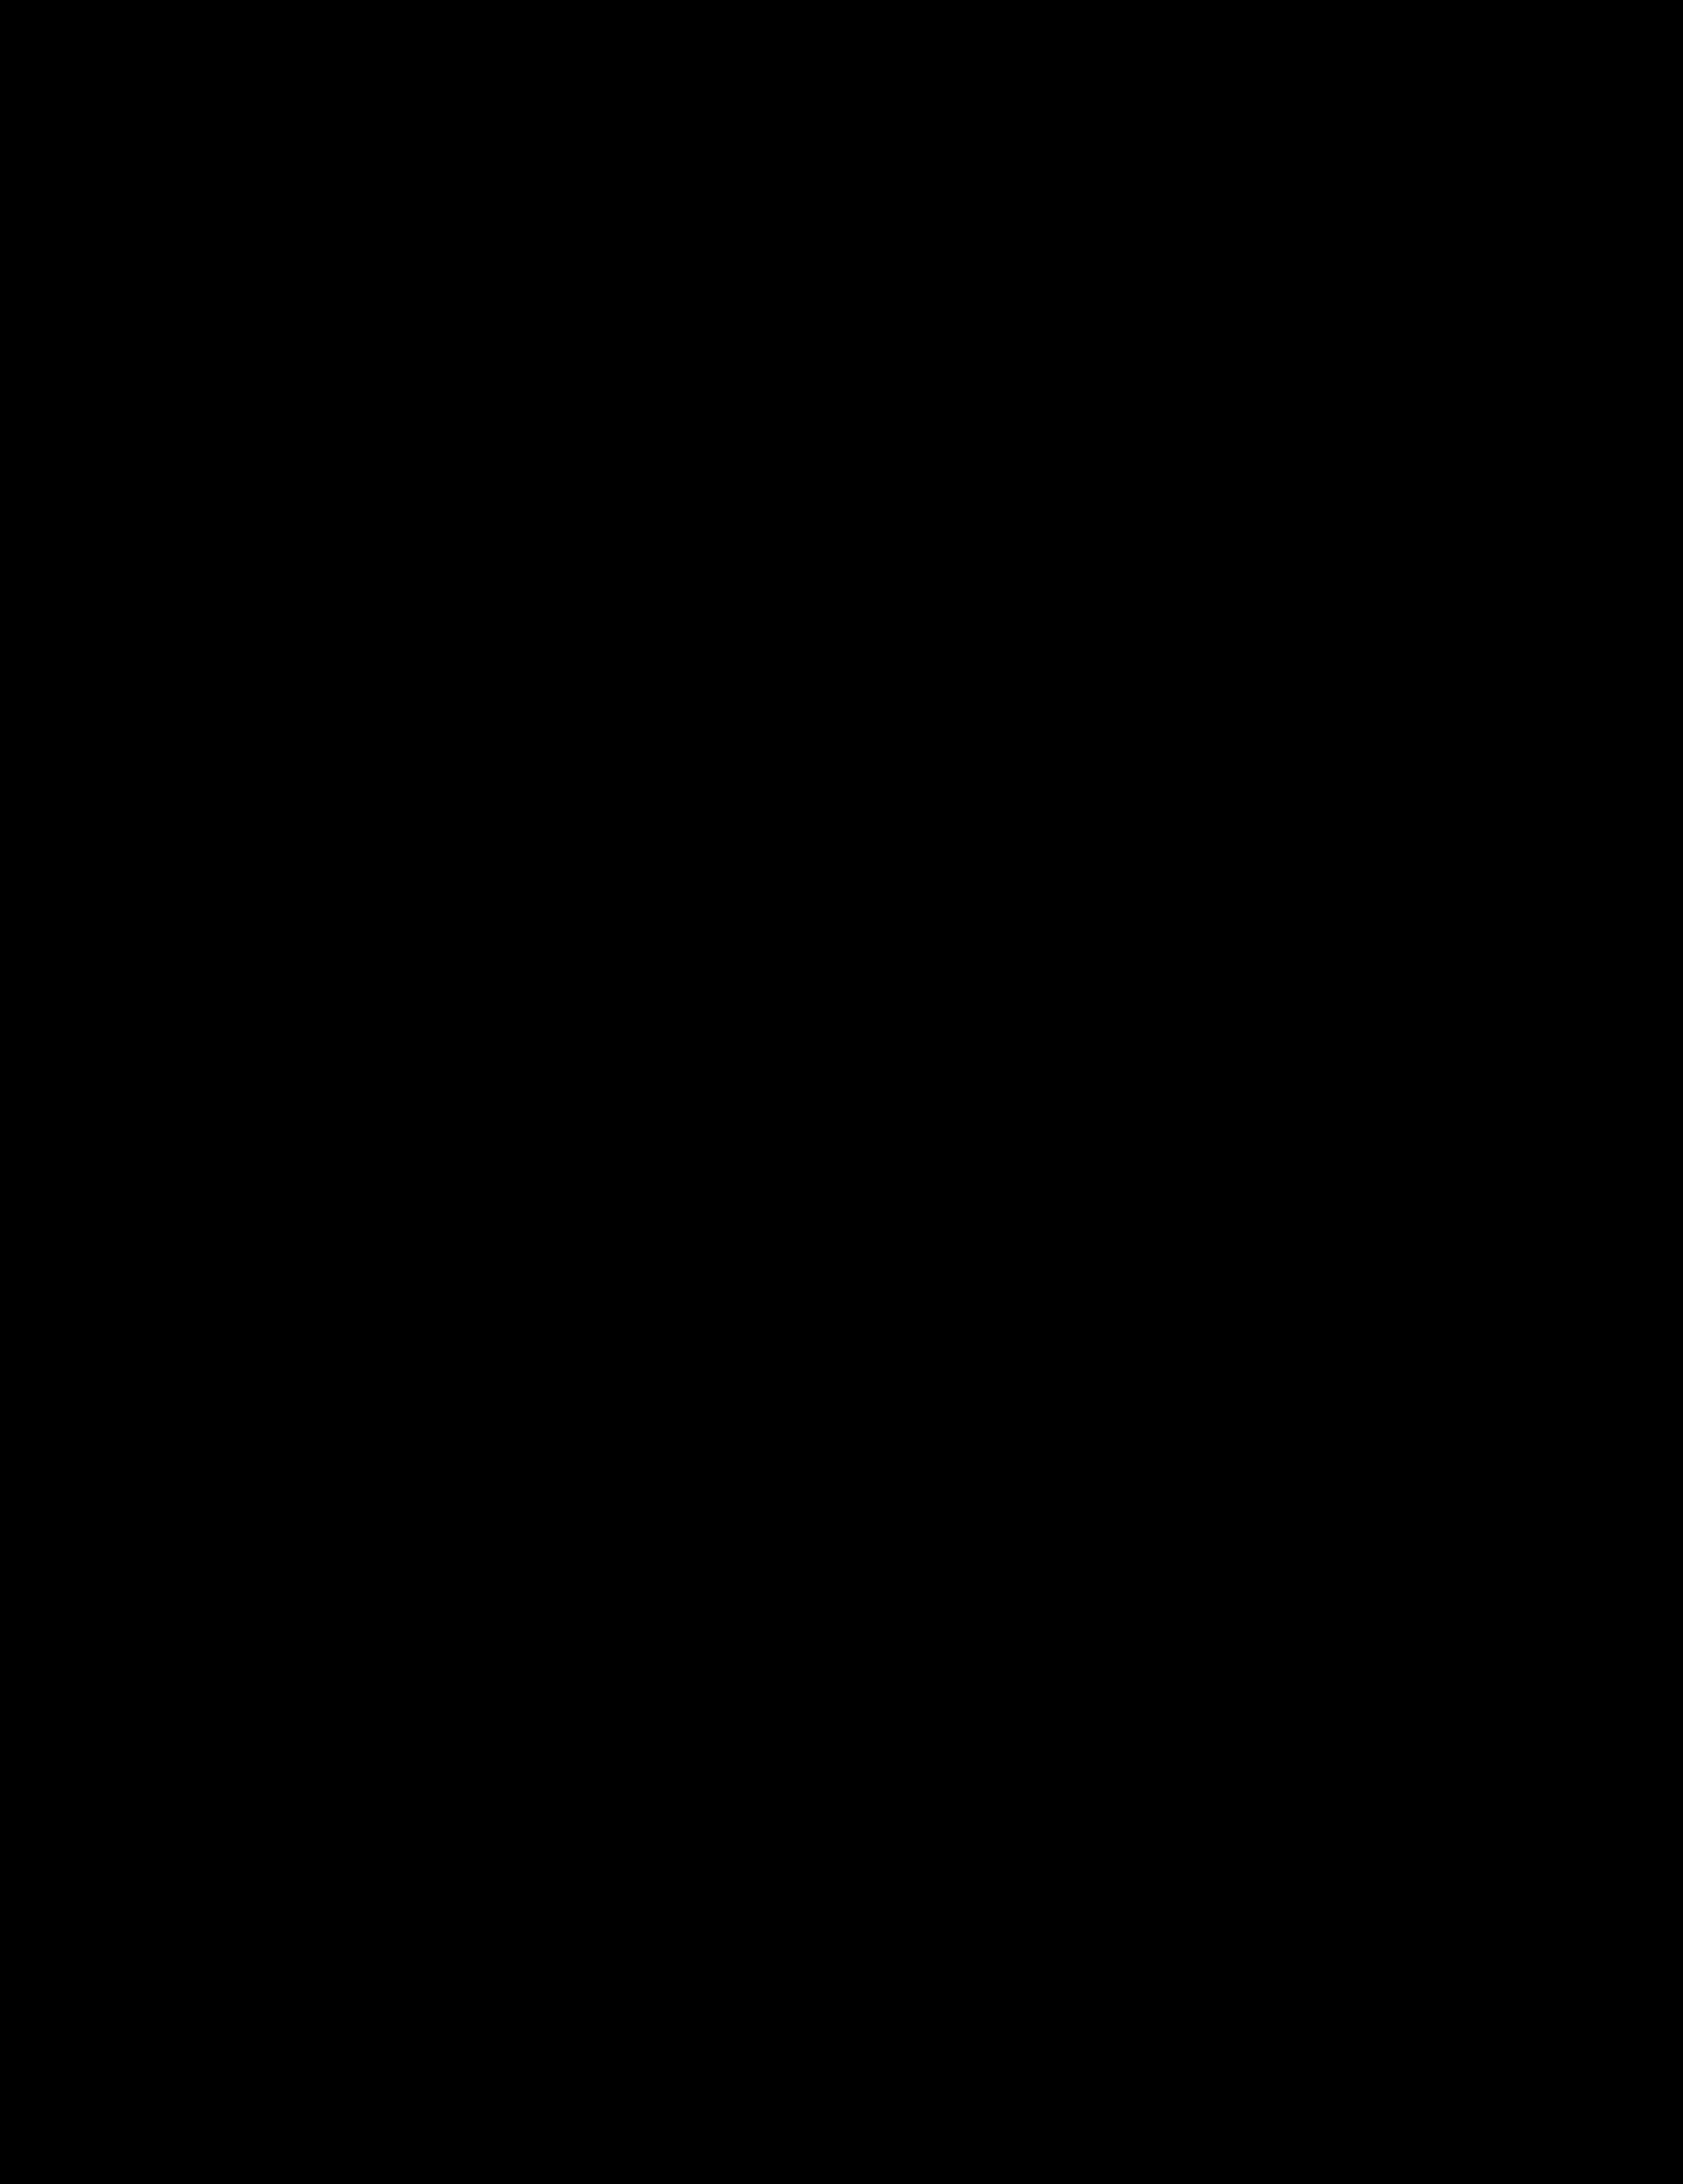 to-texan-logo.png